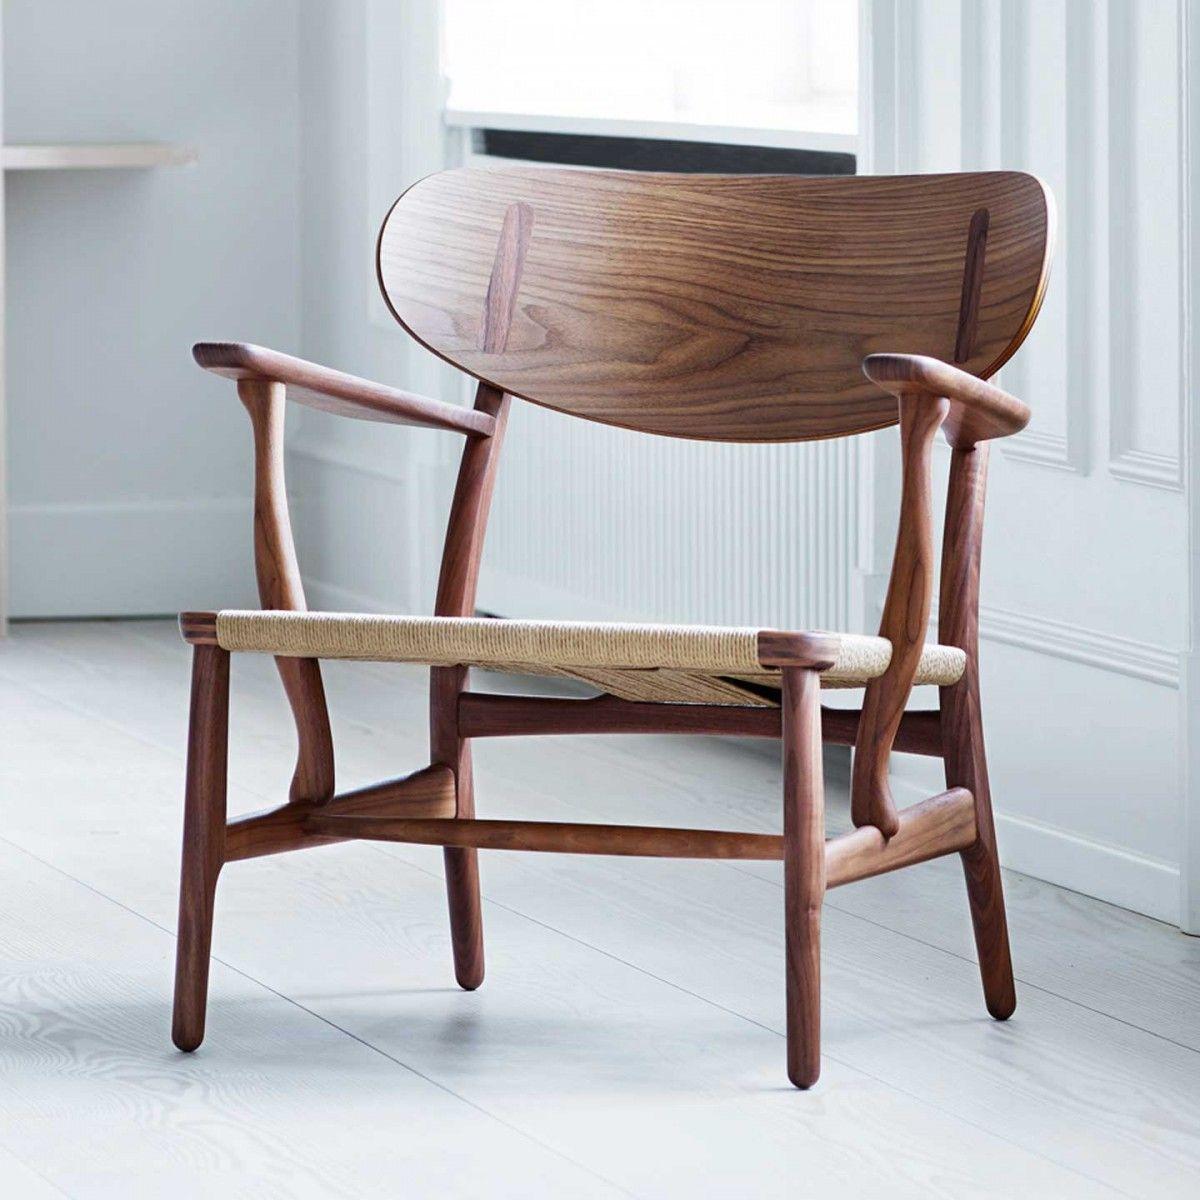 Ch22 Lounge Chair By Hans Wegner For Carl Hansen Son Furniture